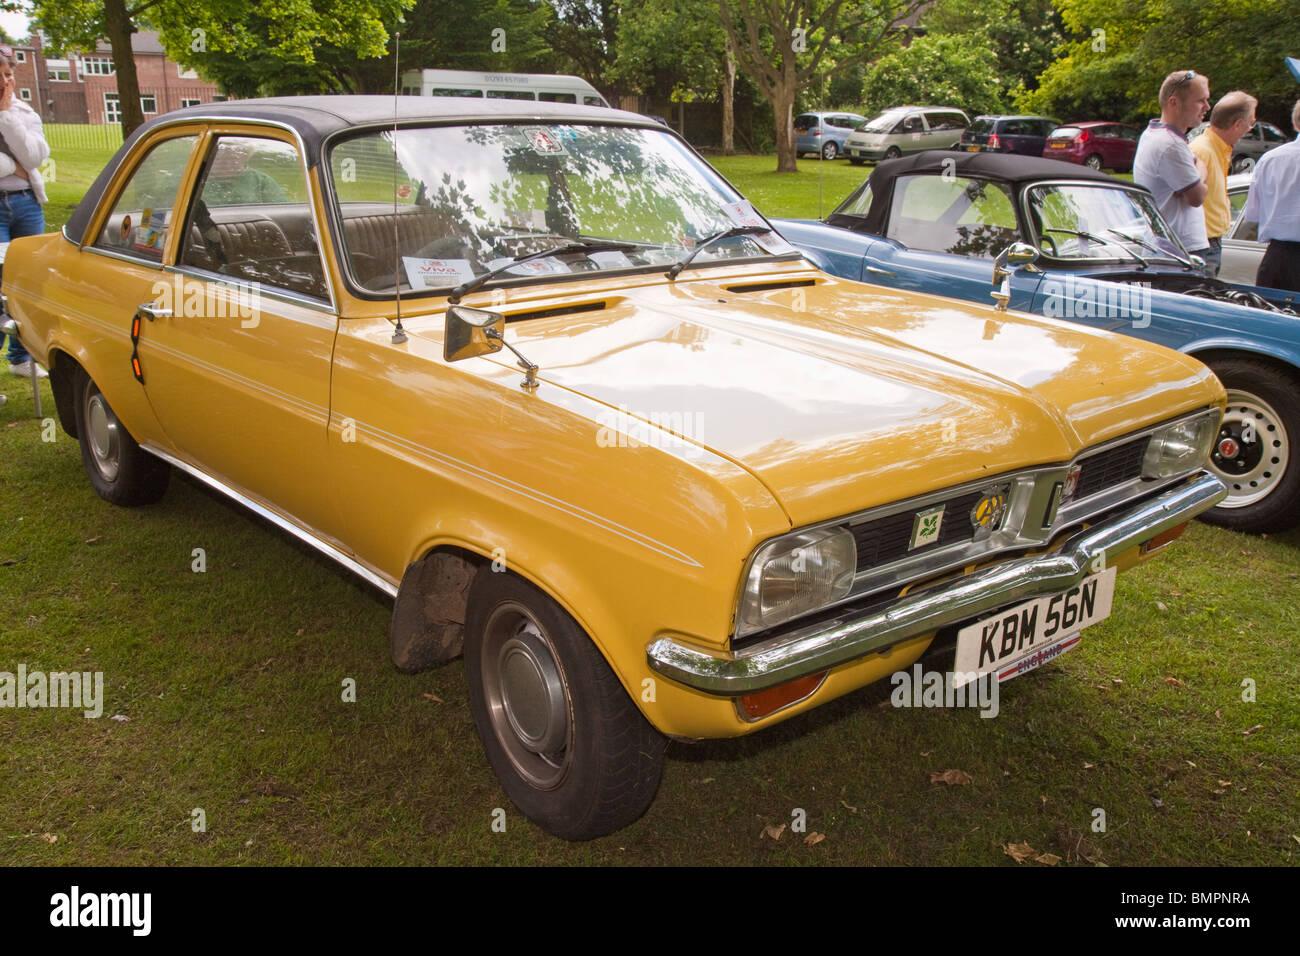 Vauxhall Viva HC classic car - Stock Image